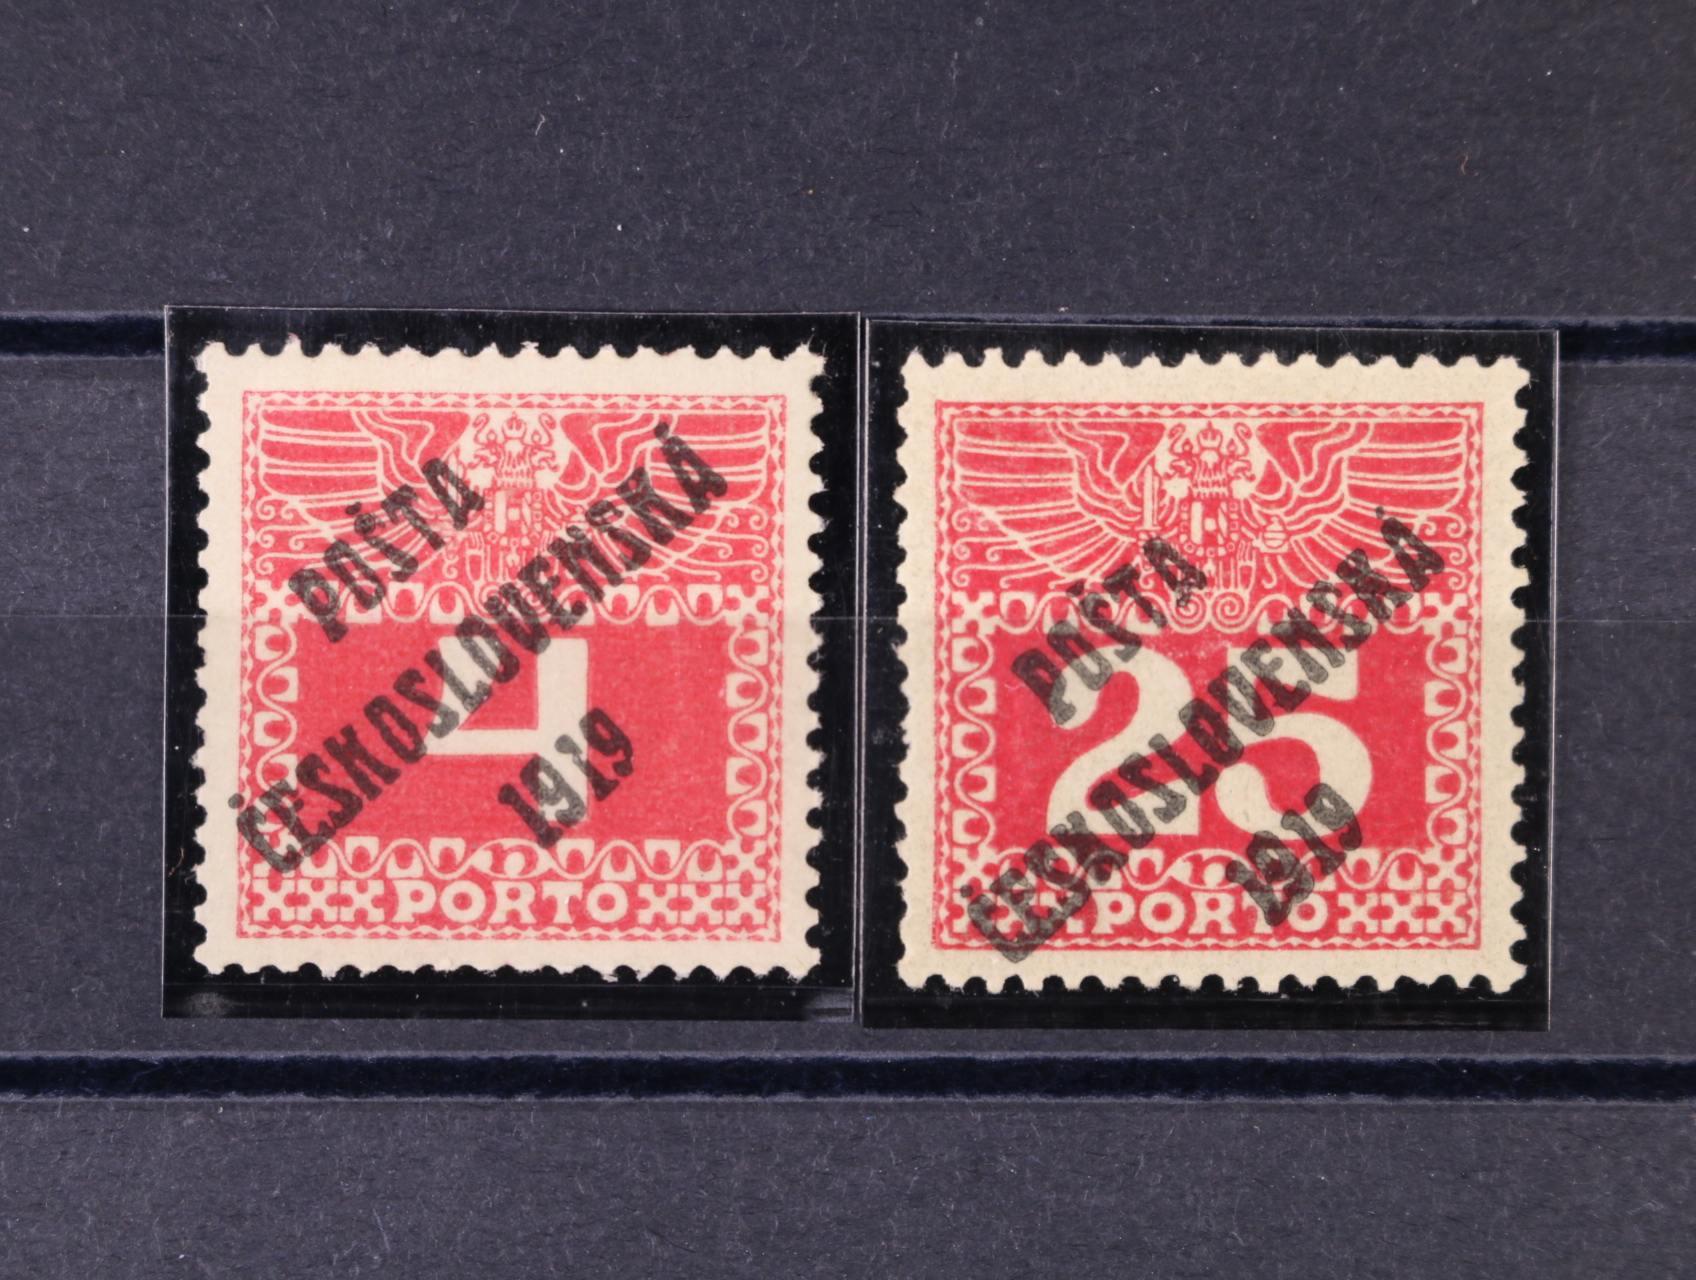 zn. č. 66, typ II, 69, typ III, zk. Gilbert, kat. cena 2000 Kč